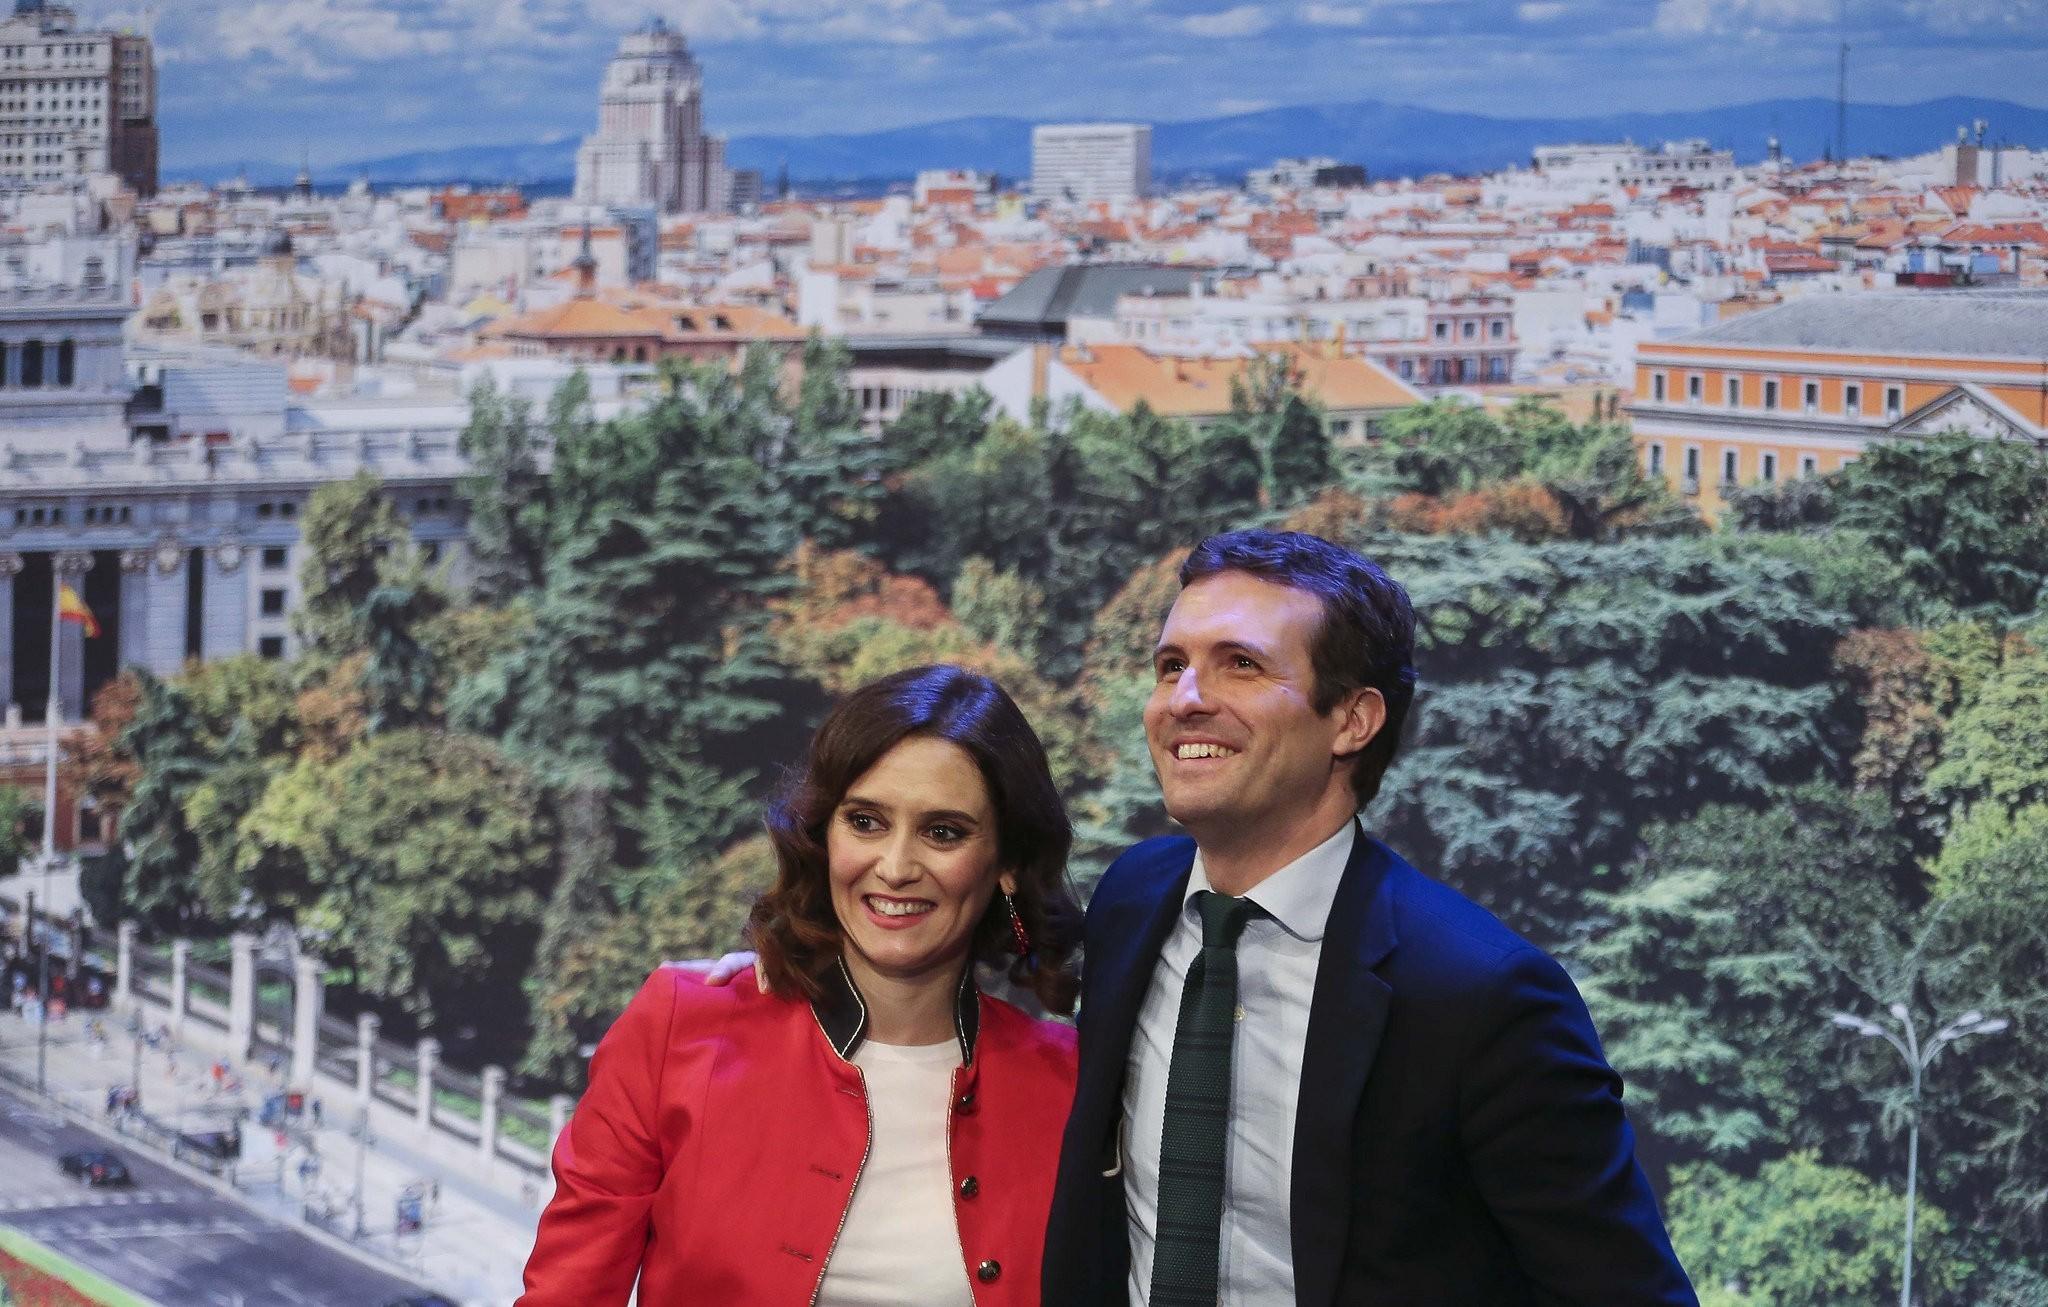 pablo casado plan díaz ayuso presidenta madrid